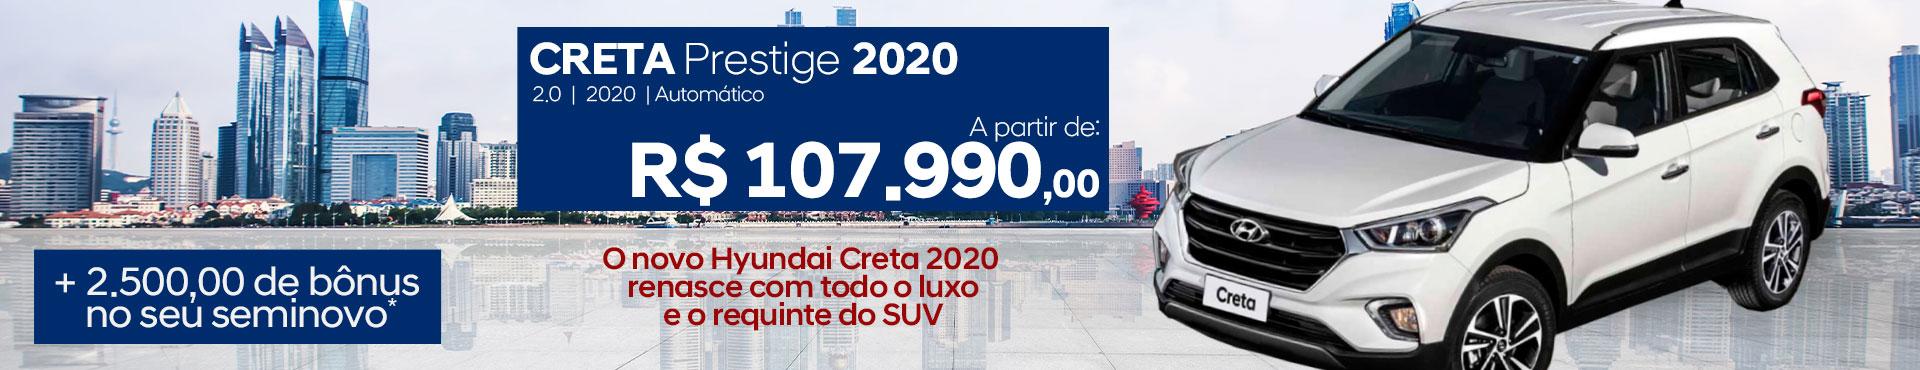 Creta Prestige 2020